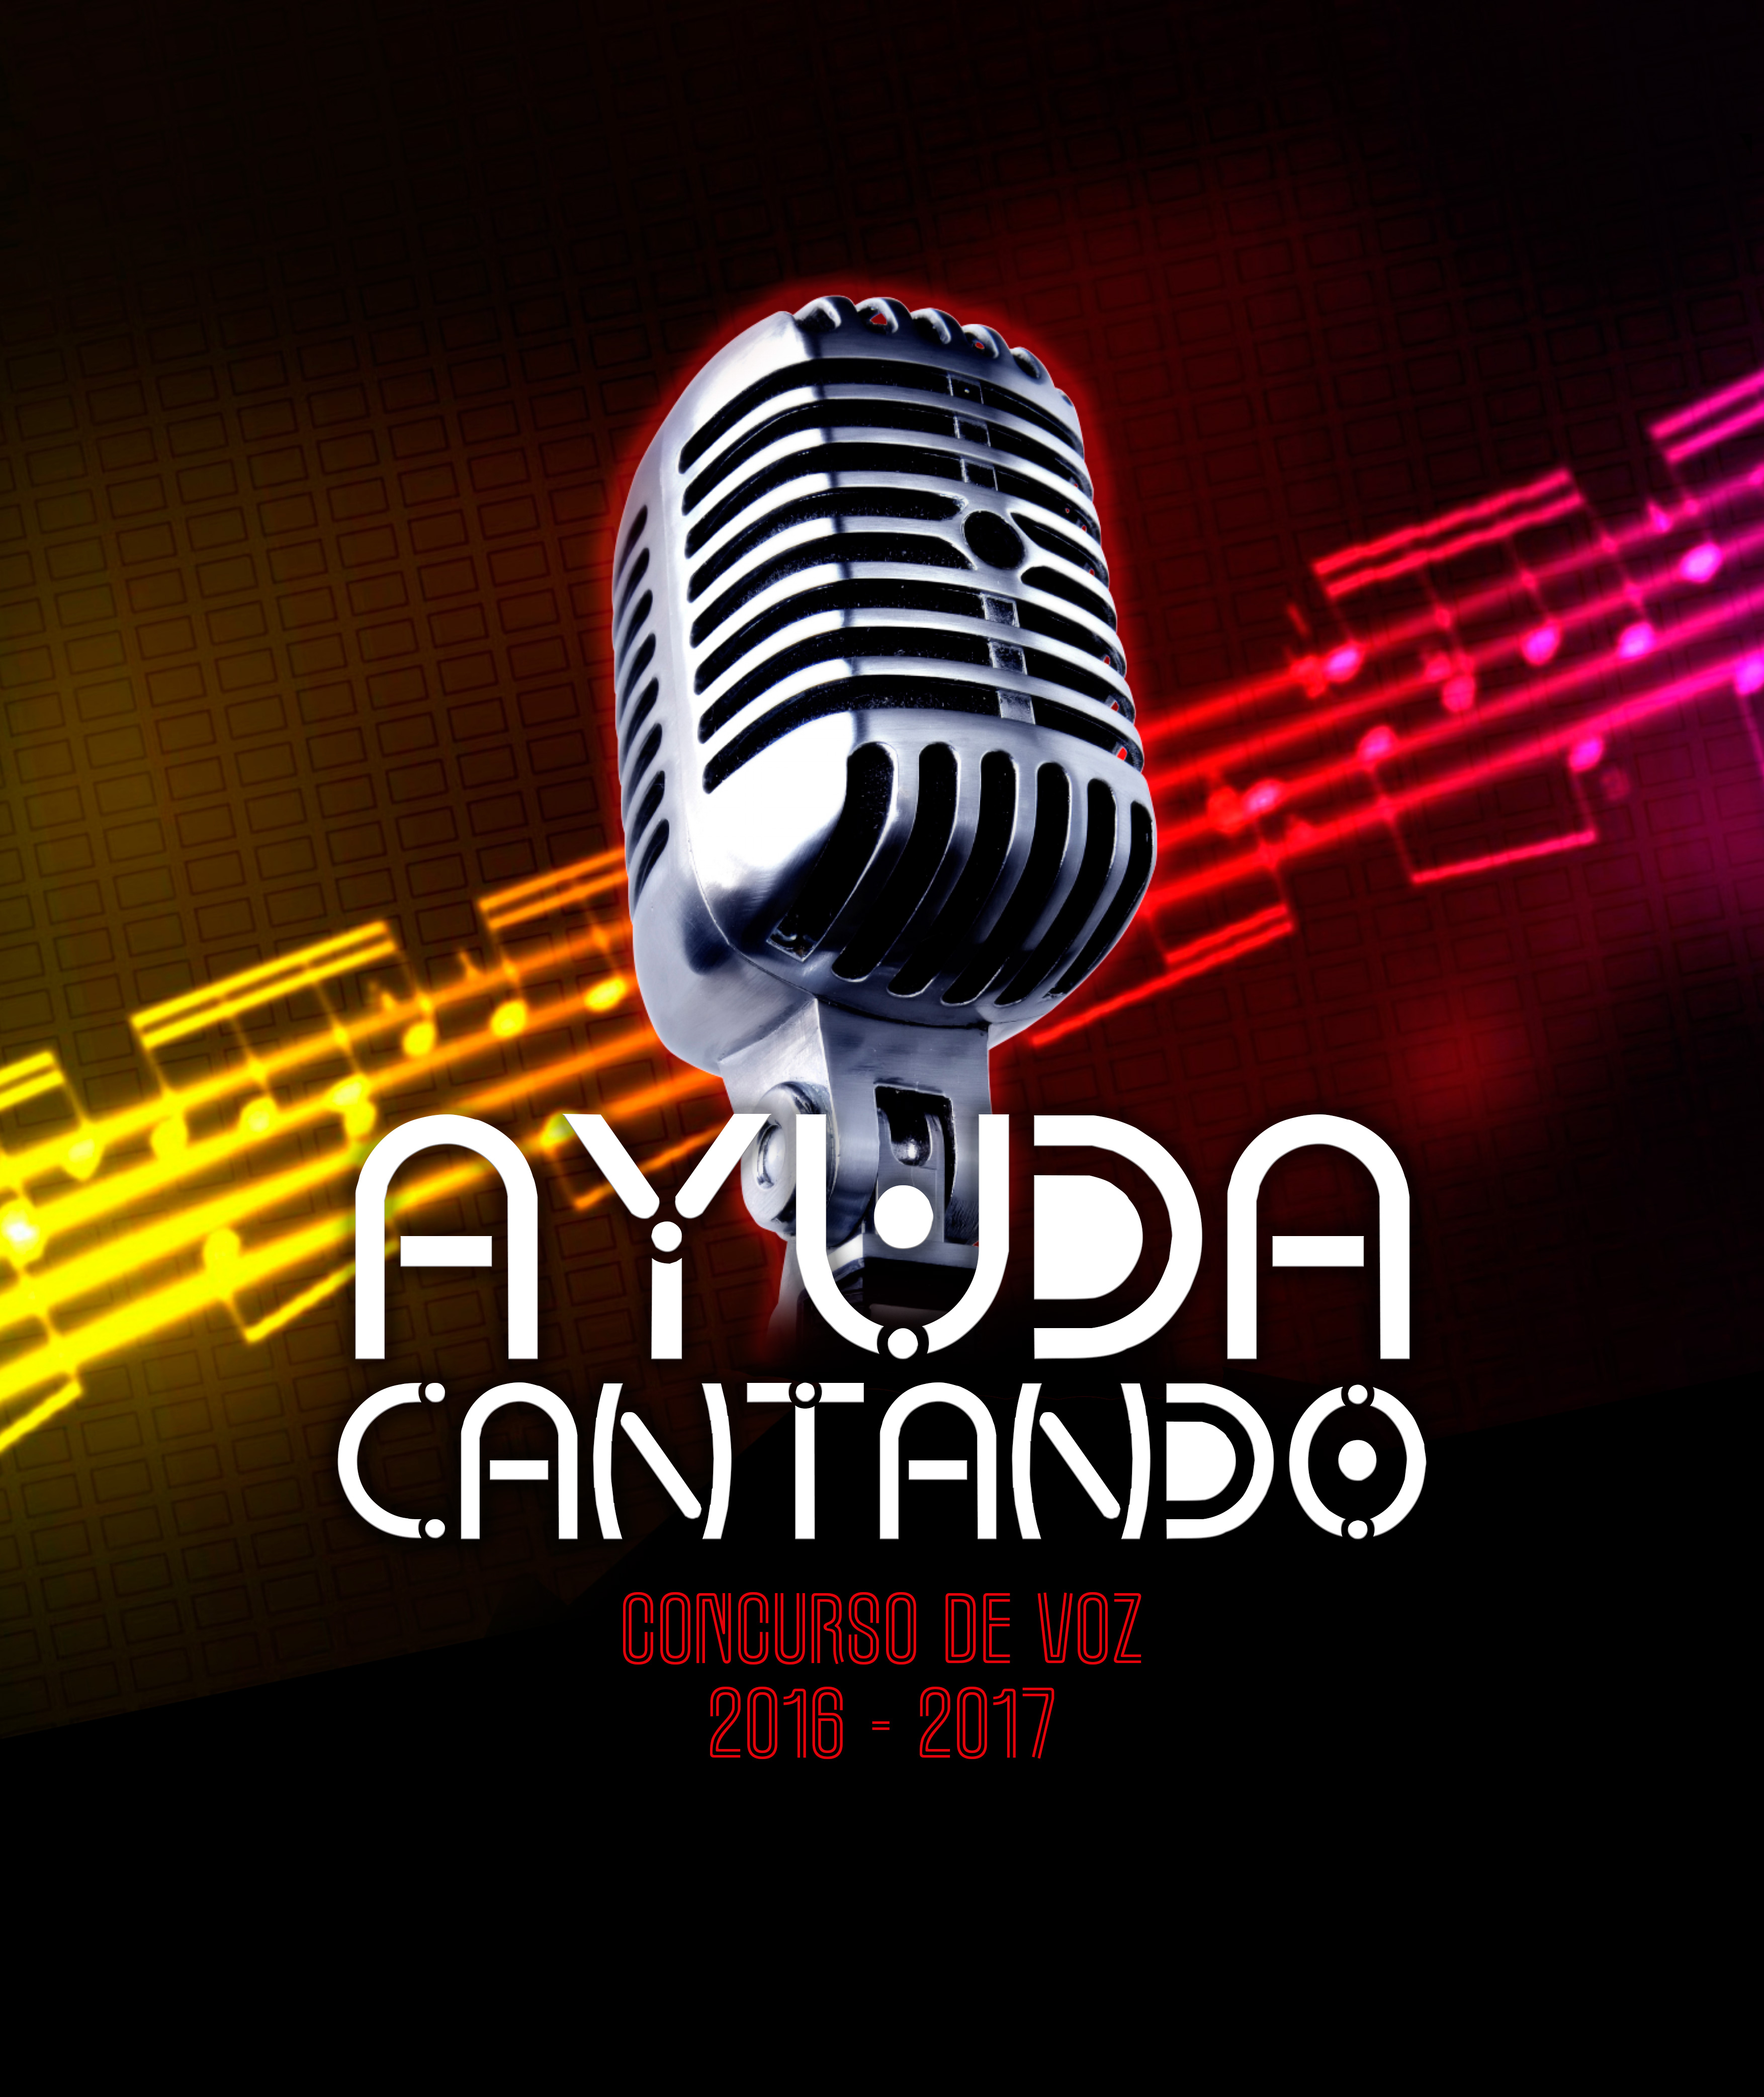 Concurso Ayuda Cantando